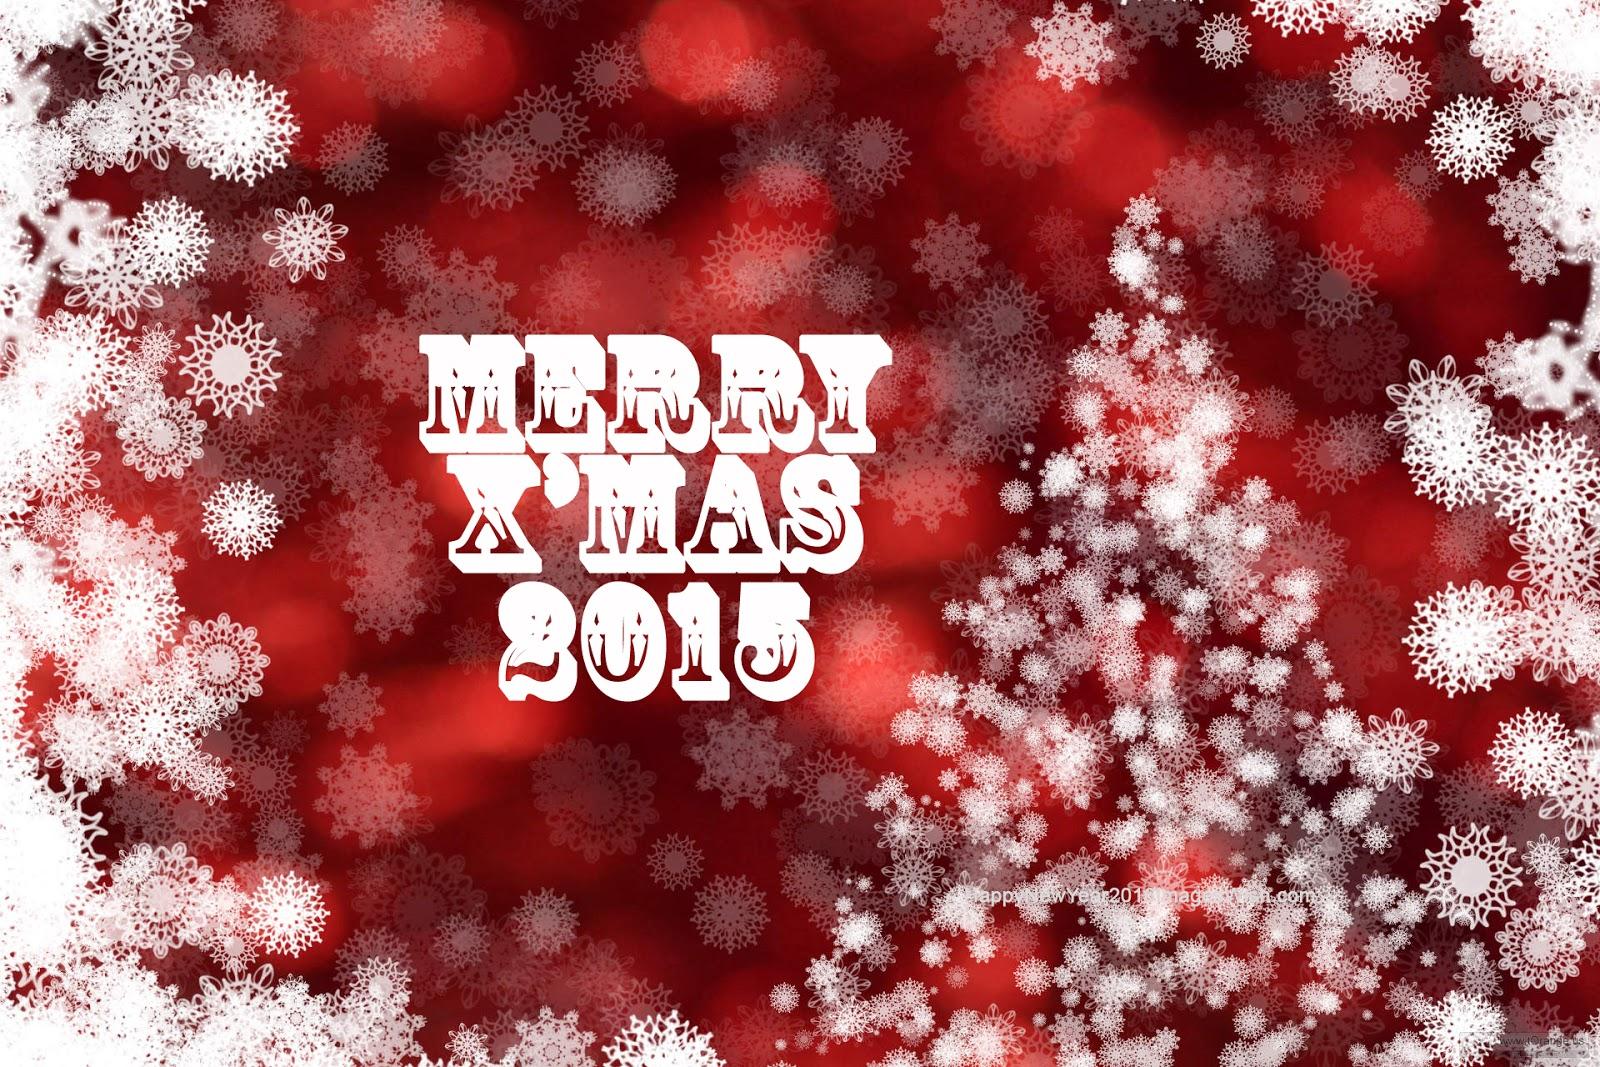 Merry xmas 2015